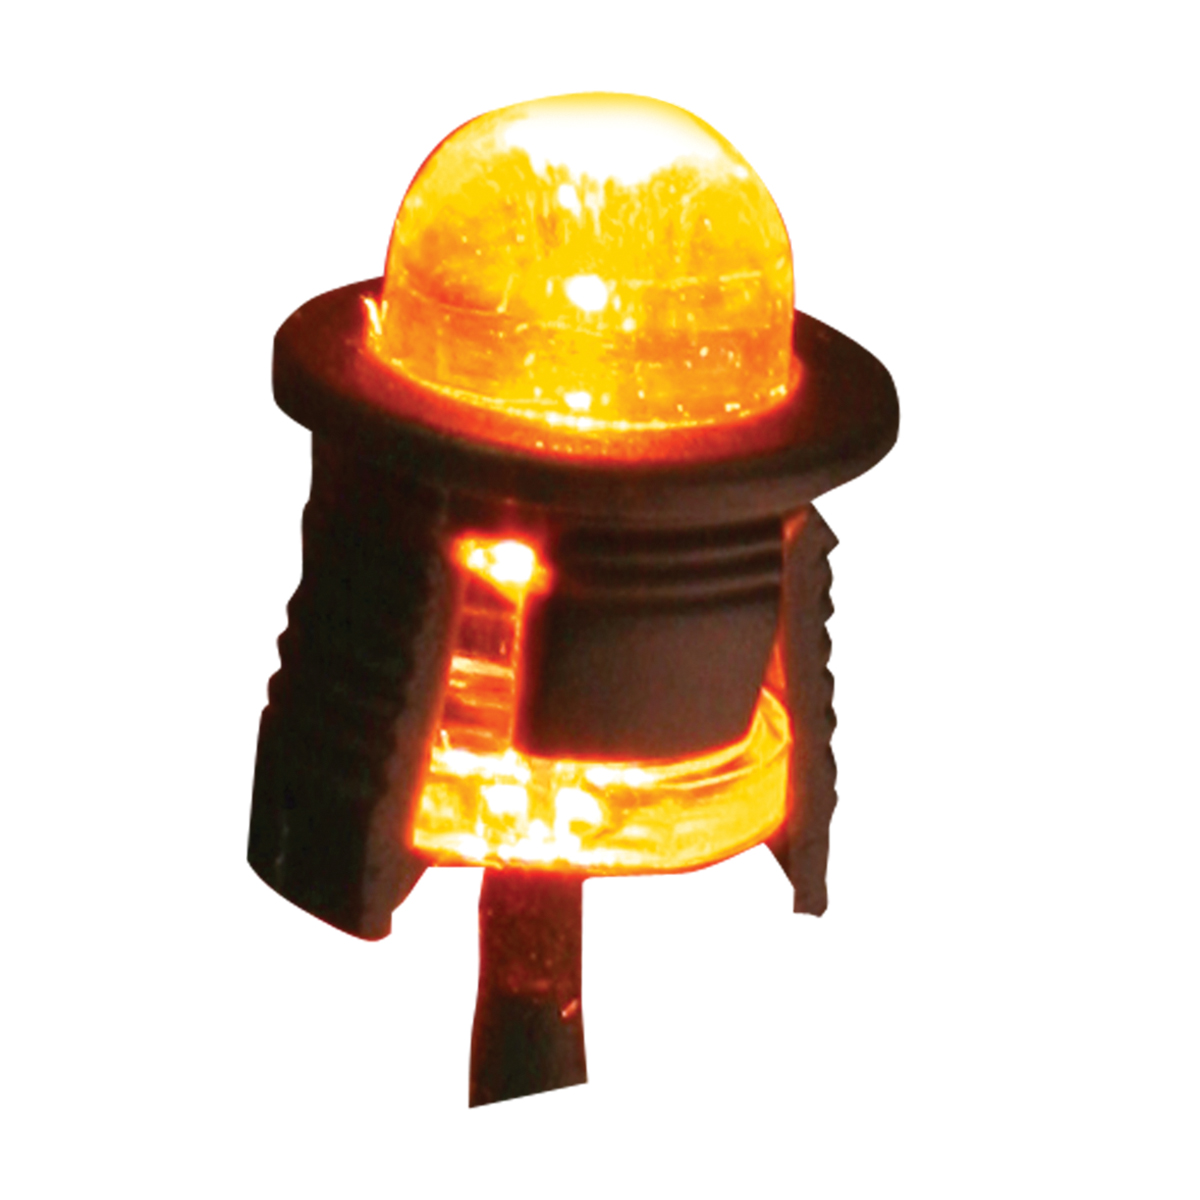 Single Amber LED Light Bulb – Profile View